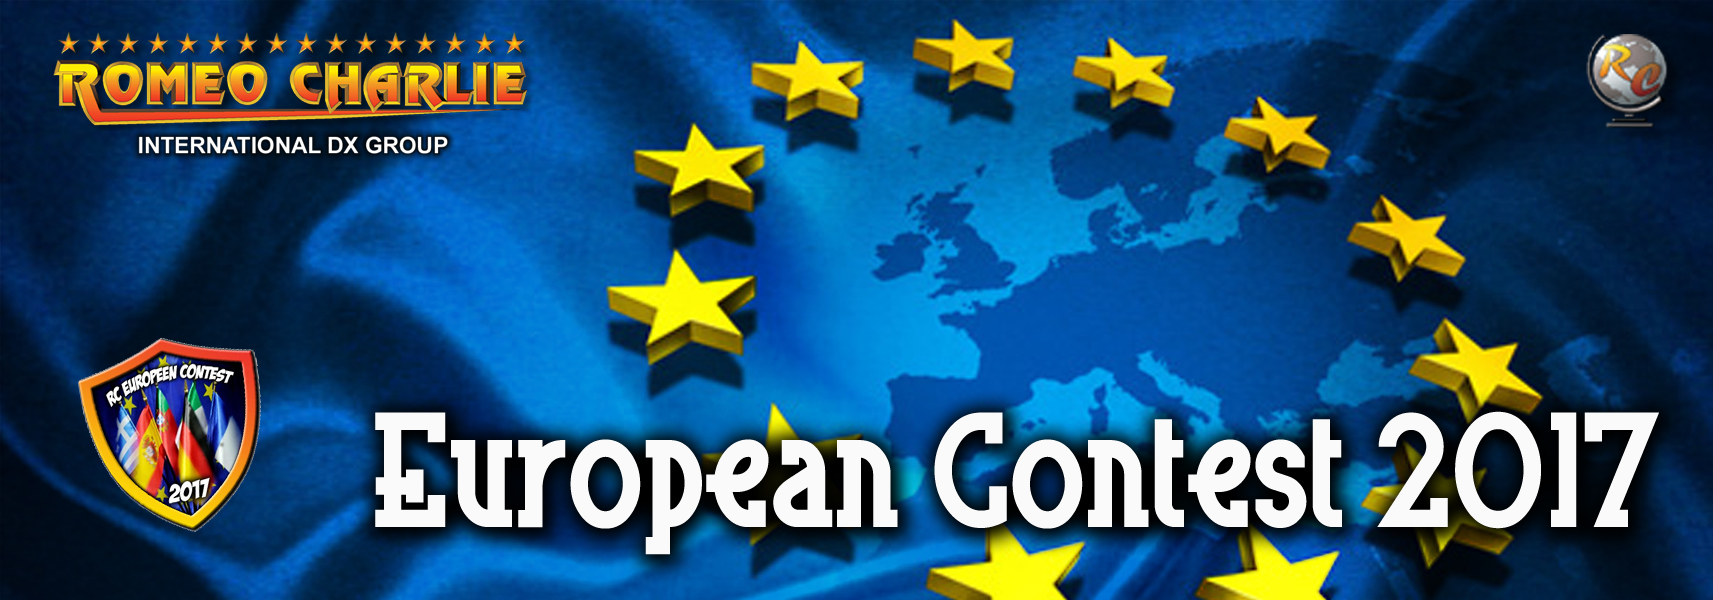 banner-europeen-contest